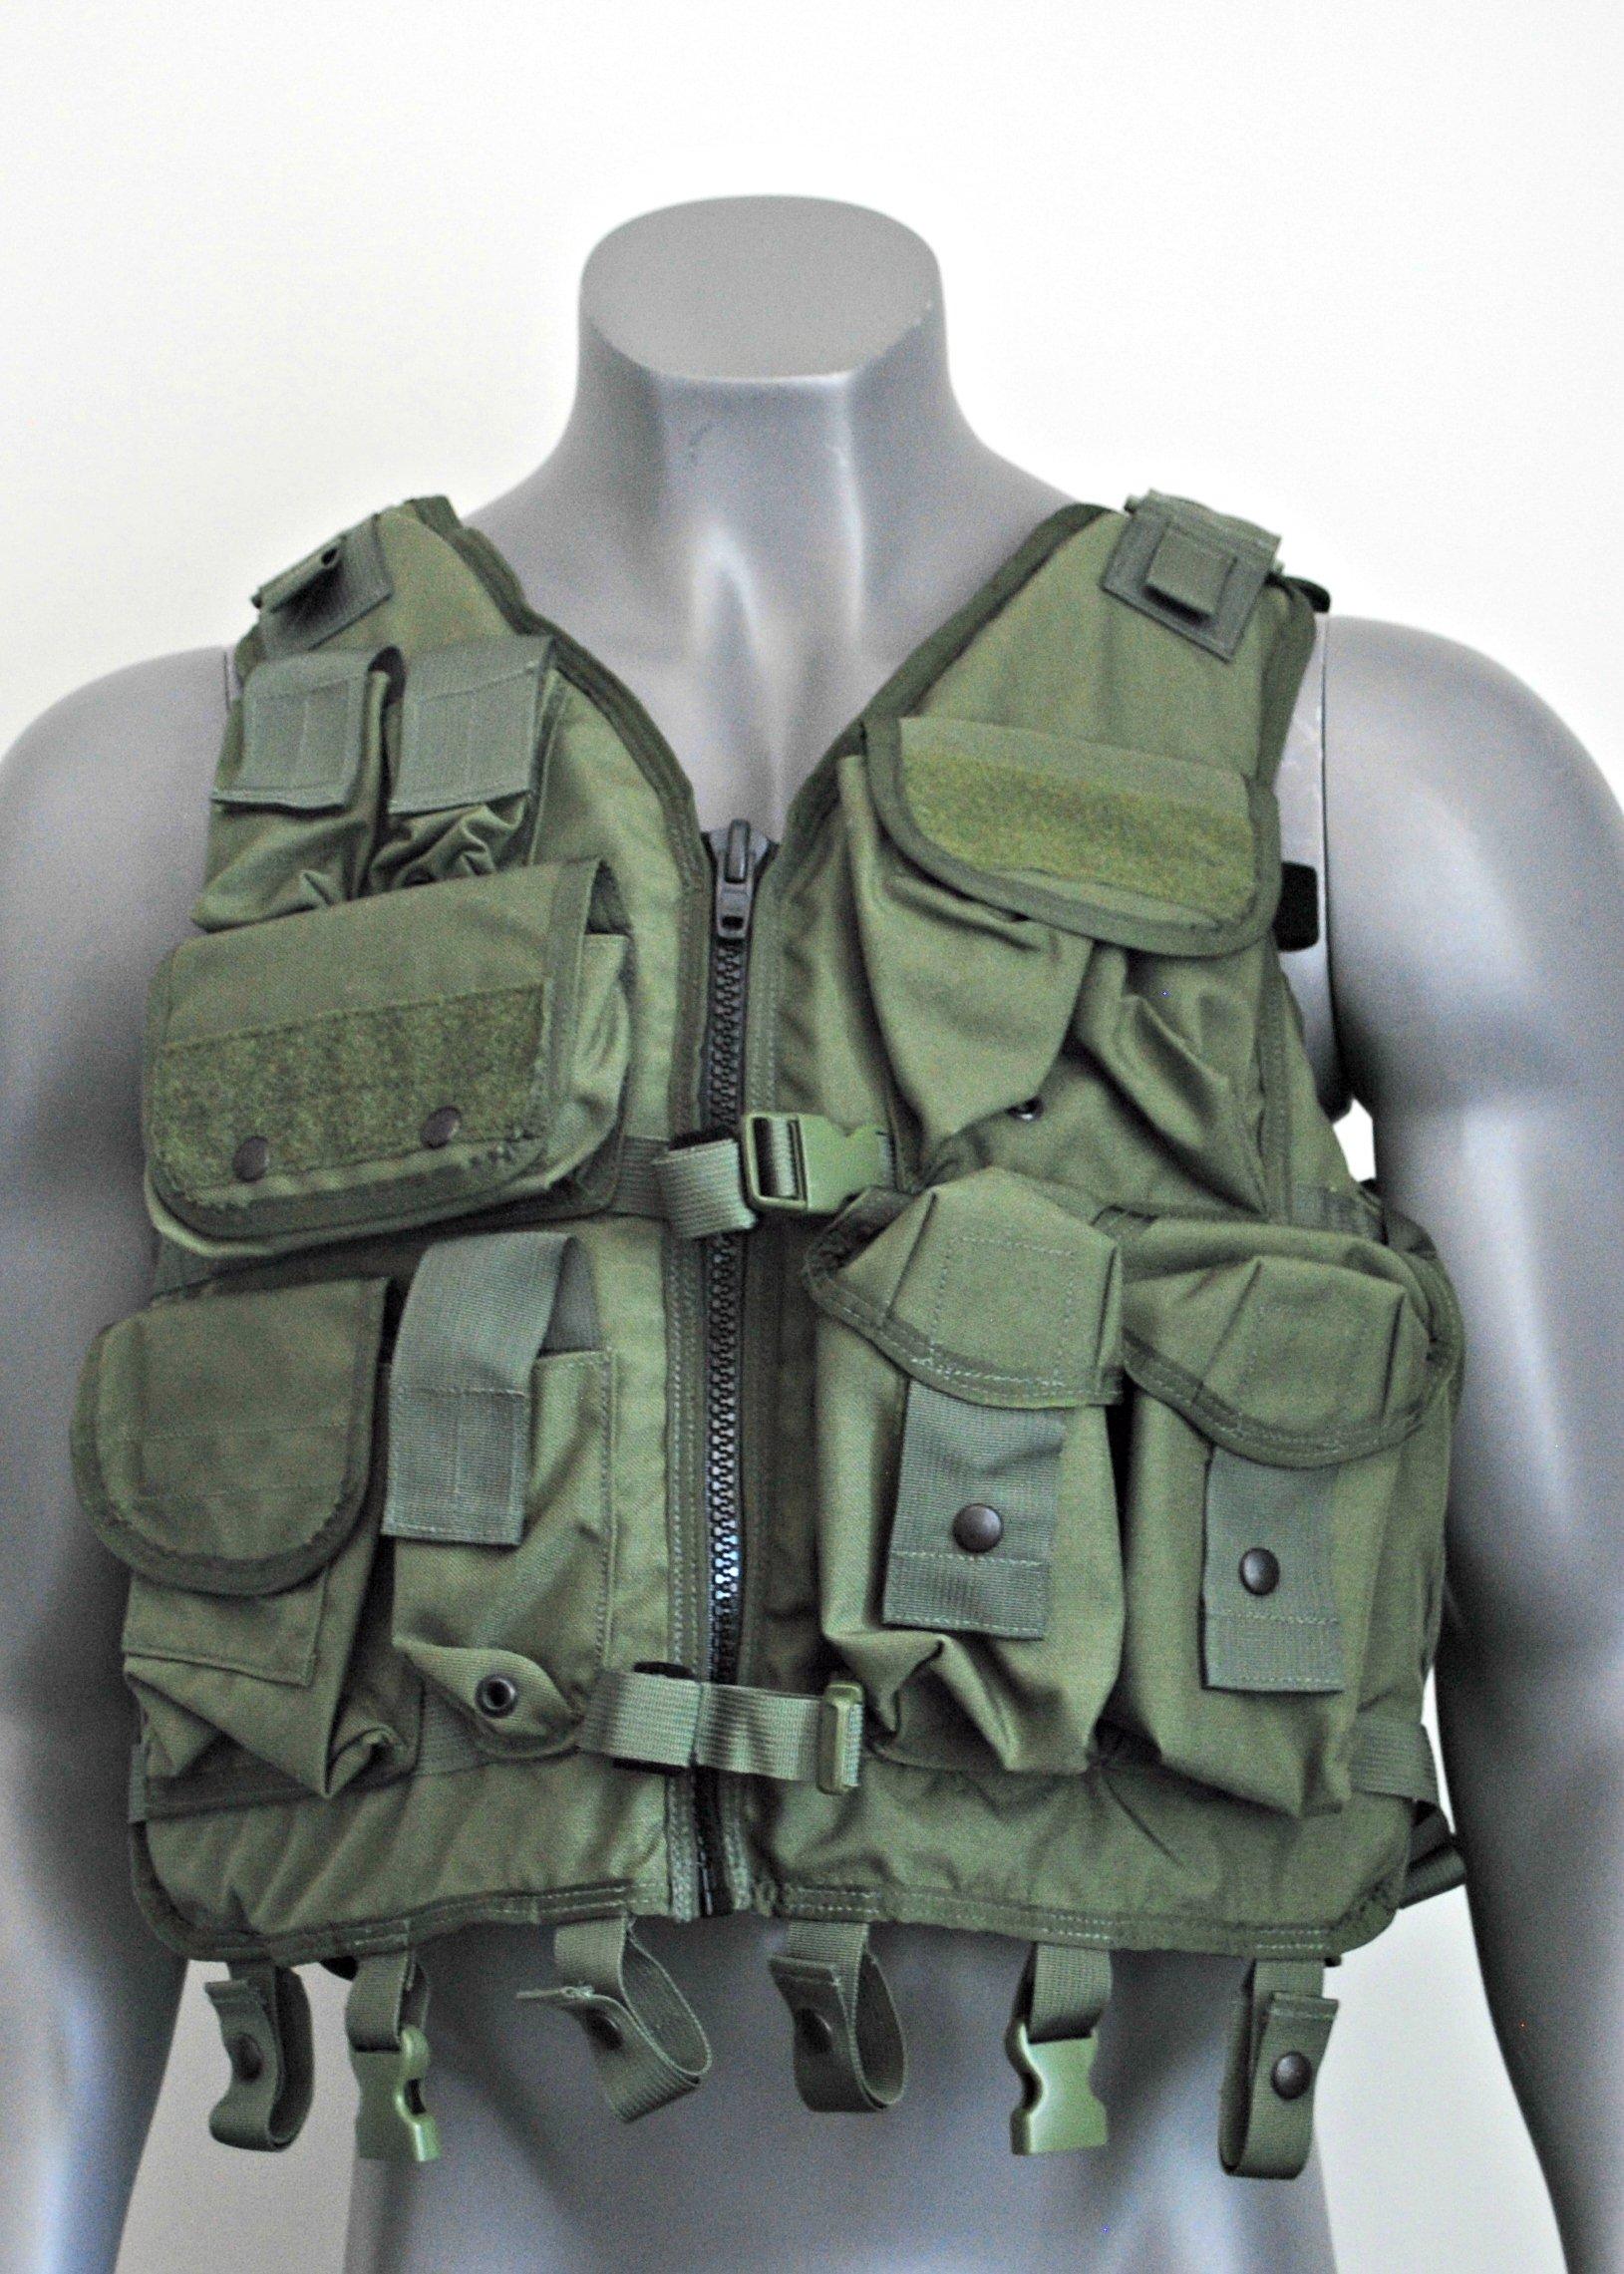 Tactical Vest w/ Flotation OLIVE DRAPE LBT-1620A-ROD